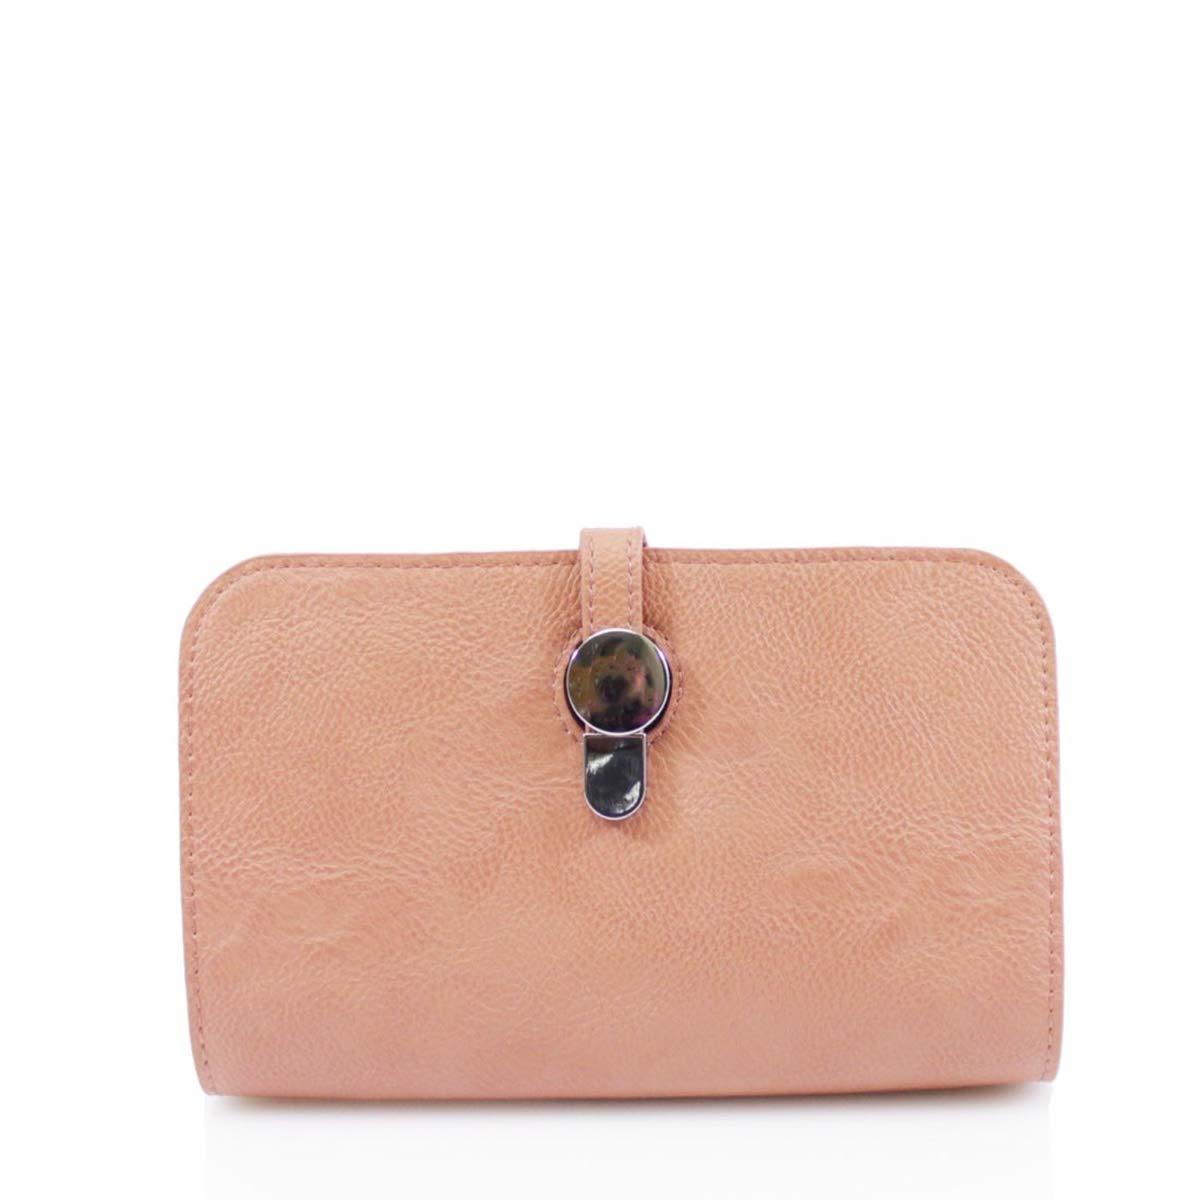 LeahWard Womens 2-in1 Purse Card Holder Clutch Bag Bus Holder J56 Black